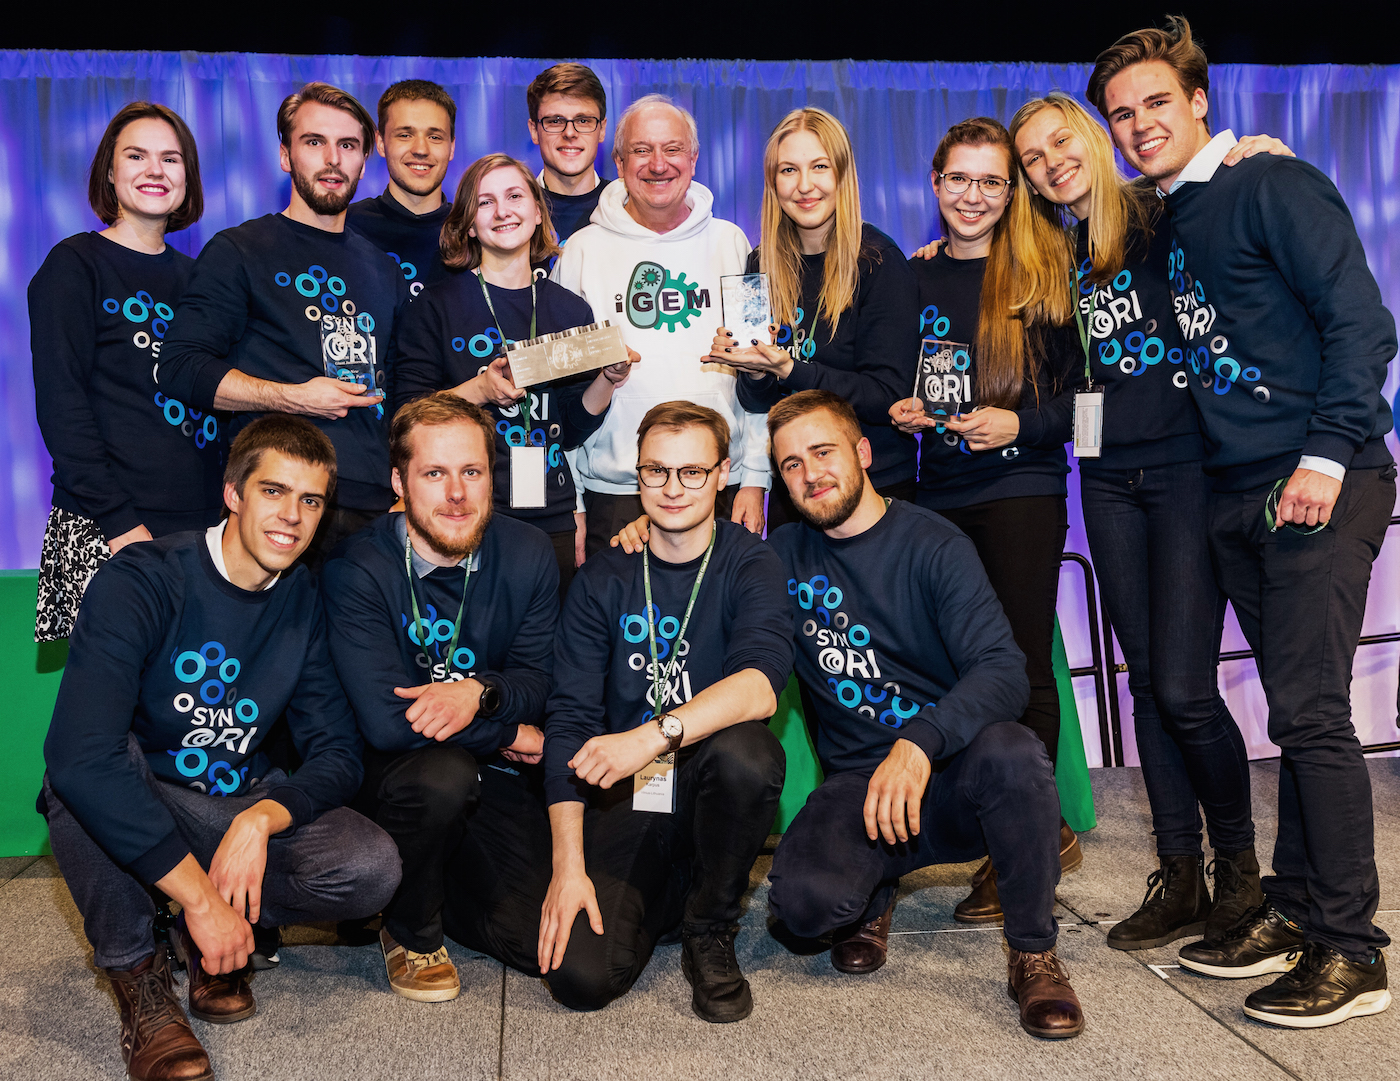 """Vilnius-Lithuania iGEM 2017"" komanda kartu su ""iGEM"" prezidentu Randy Rettberg (antroje eilėje šeštas iš k.)."